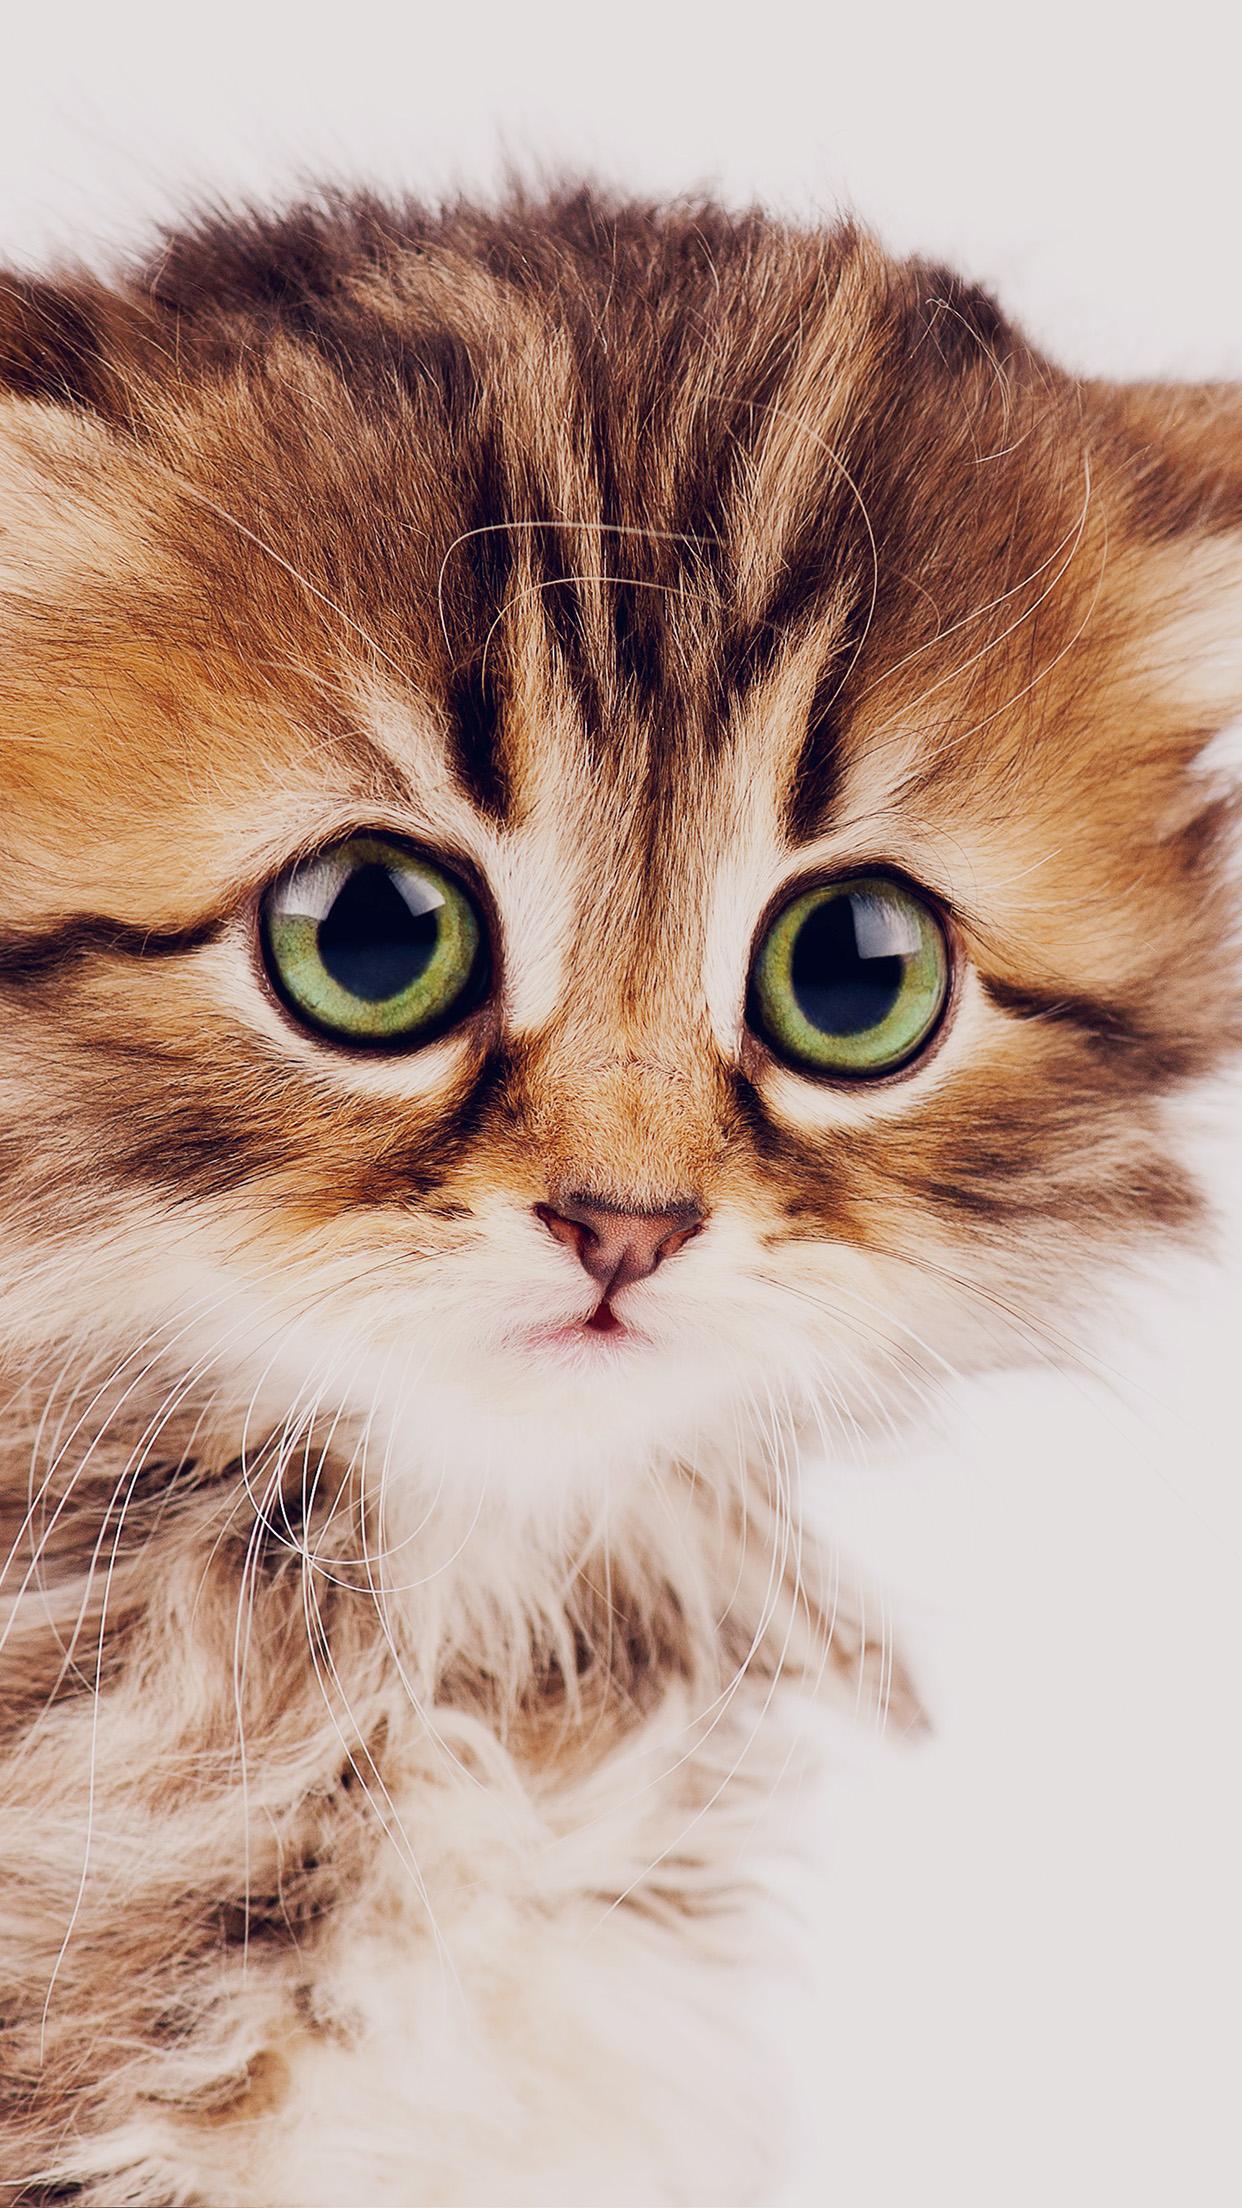 | ms23-sad-kitten-cat-animal-nature-cute